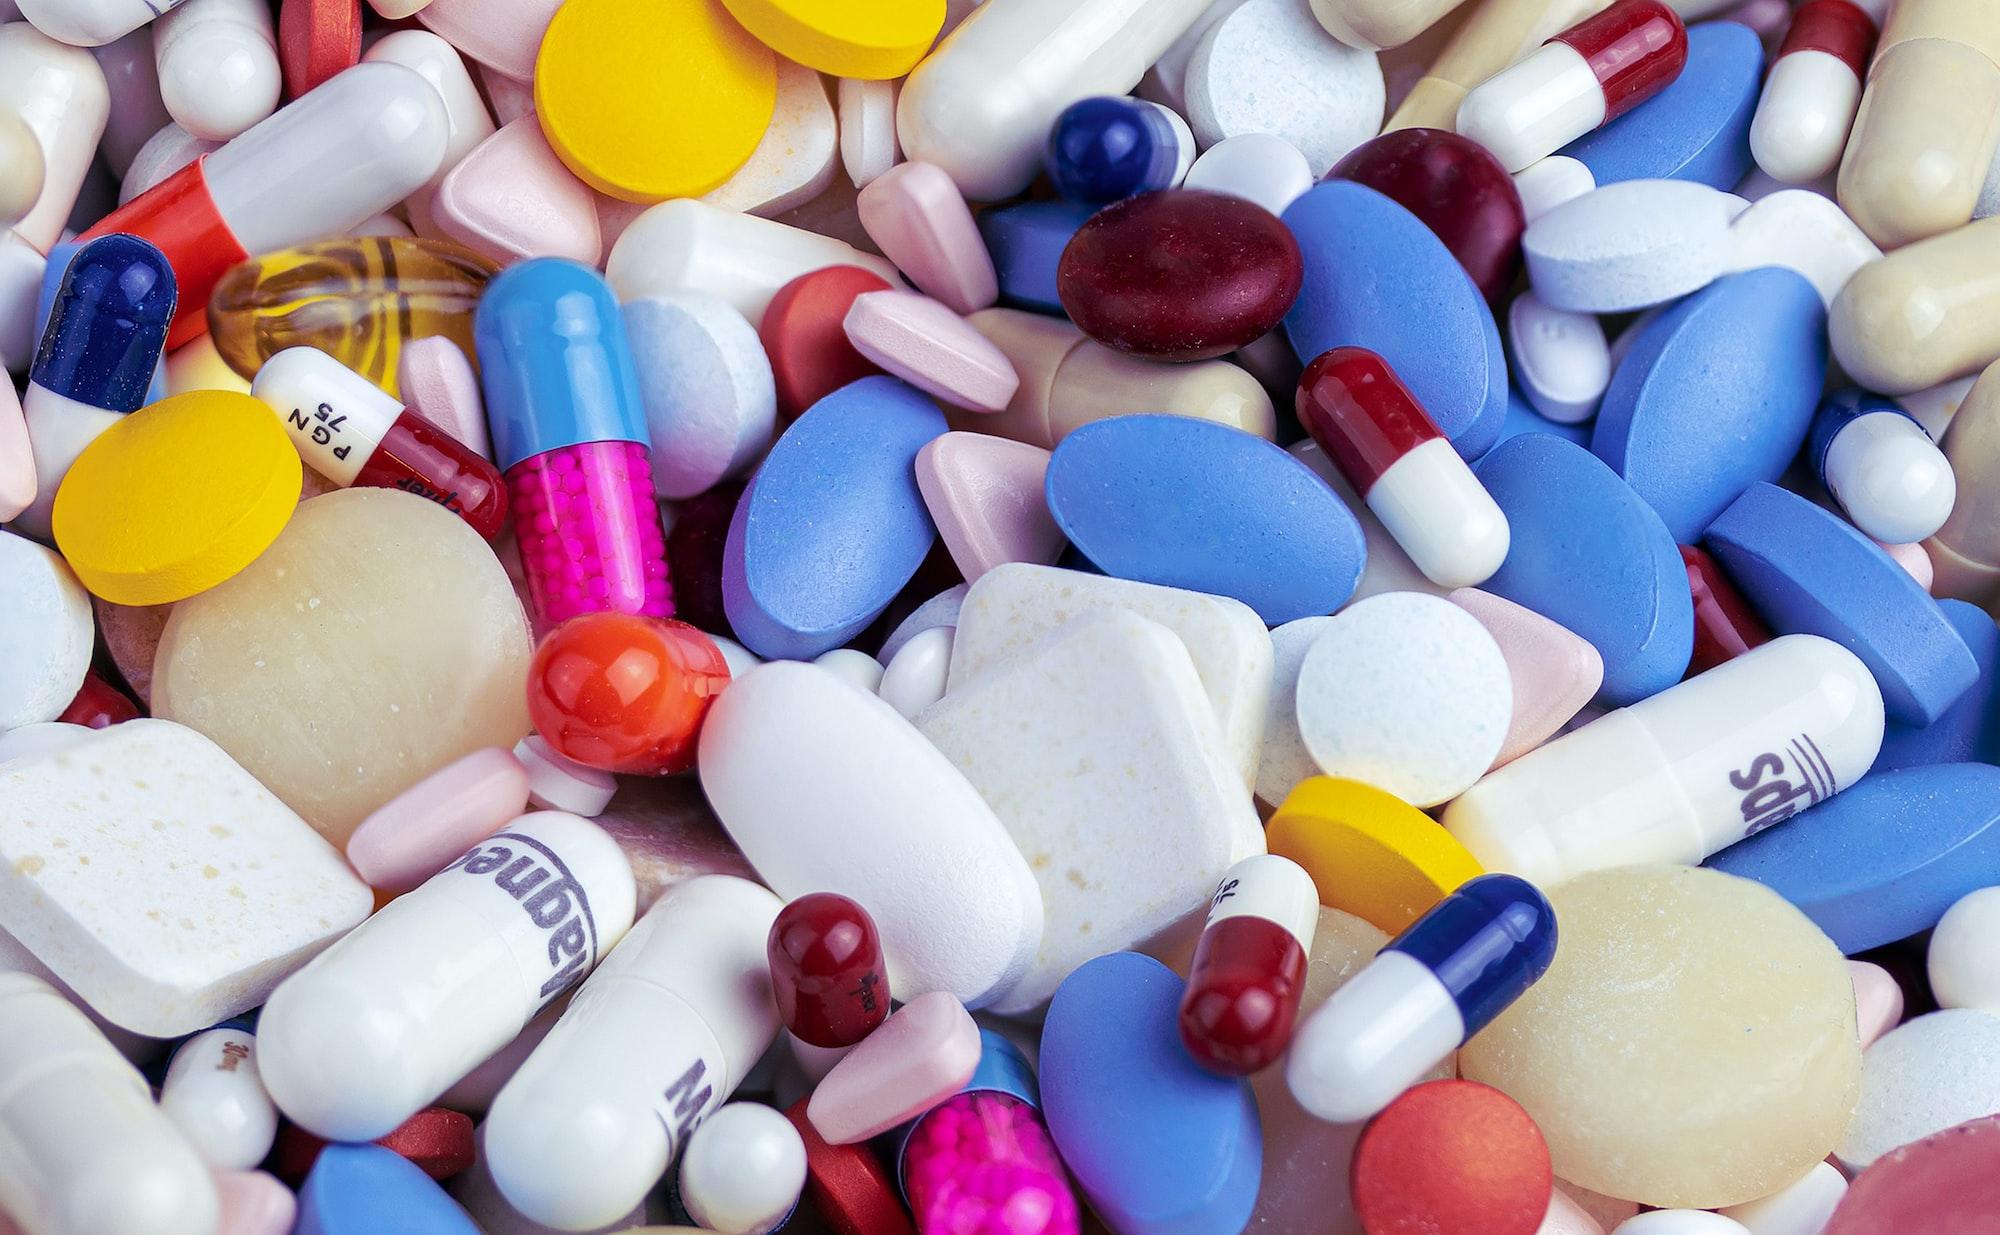 colorful drug mix